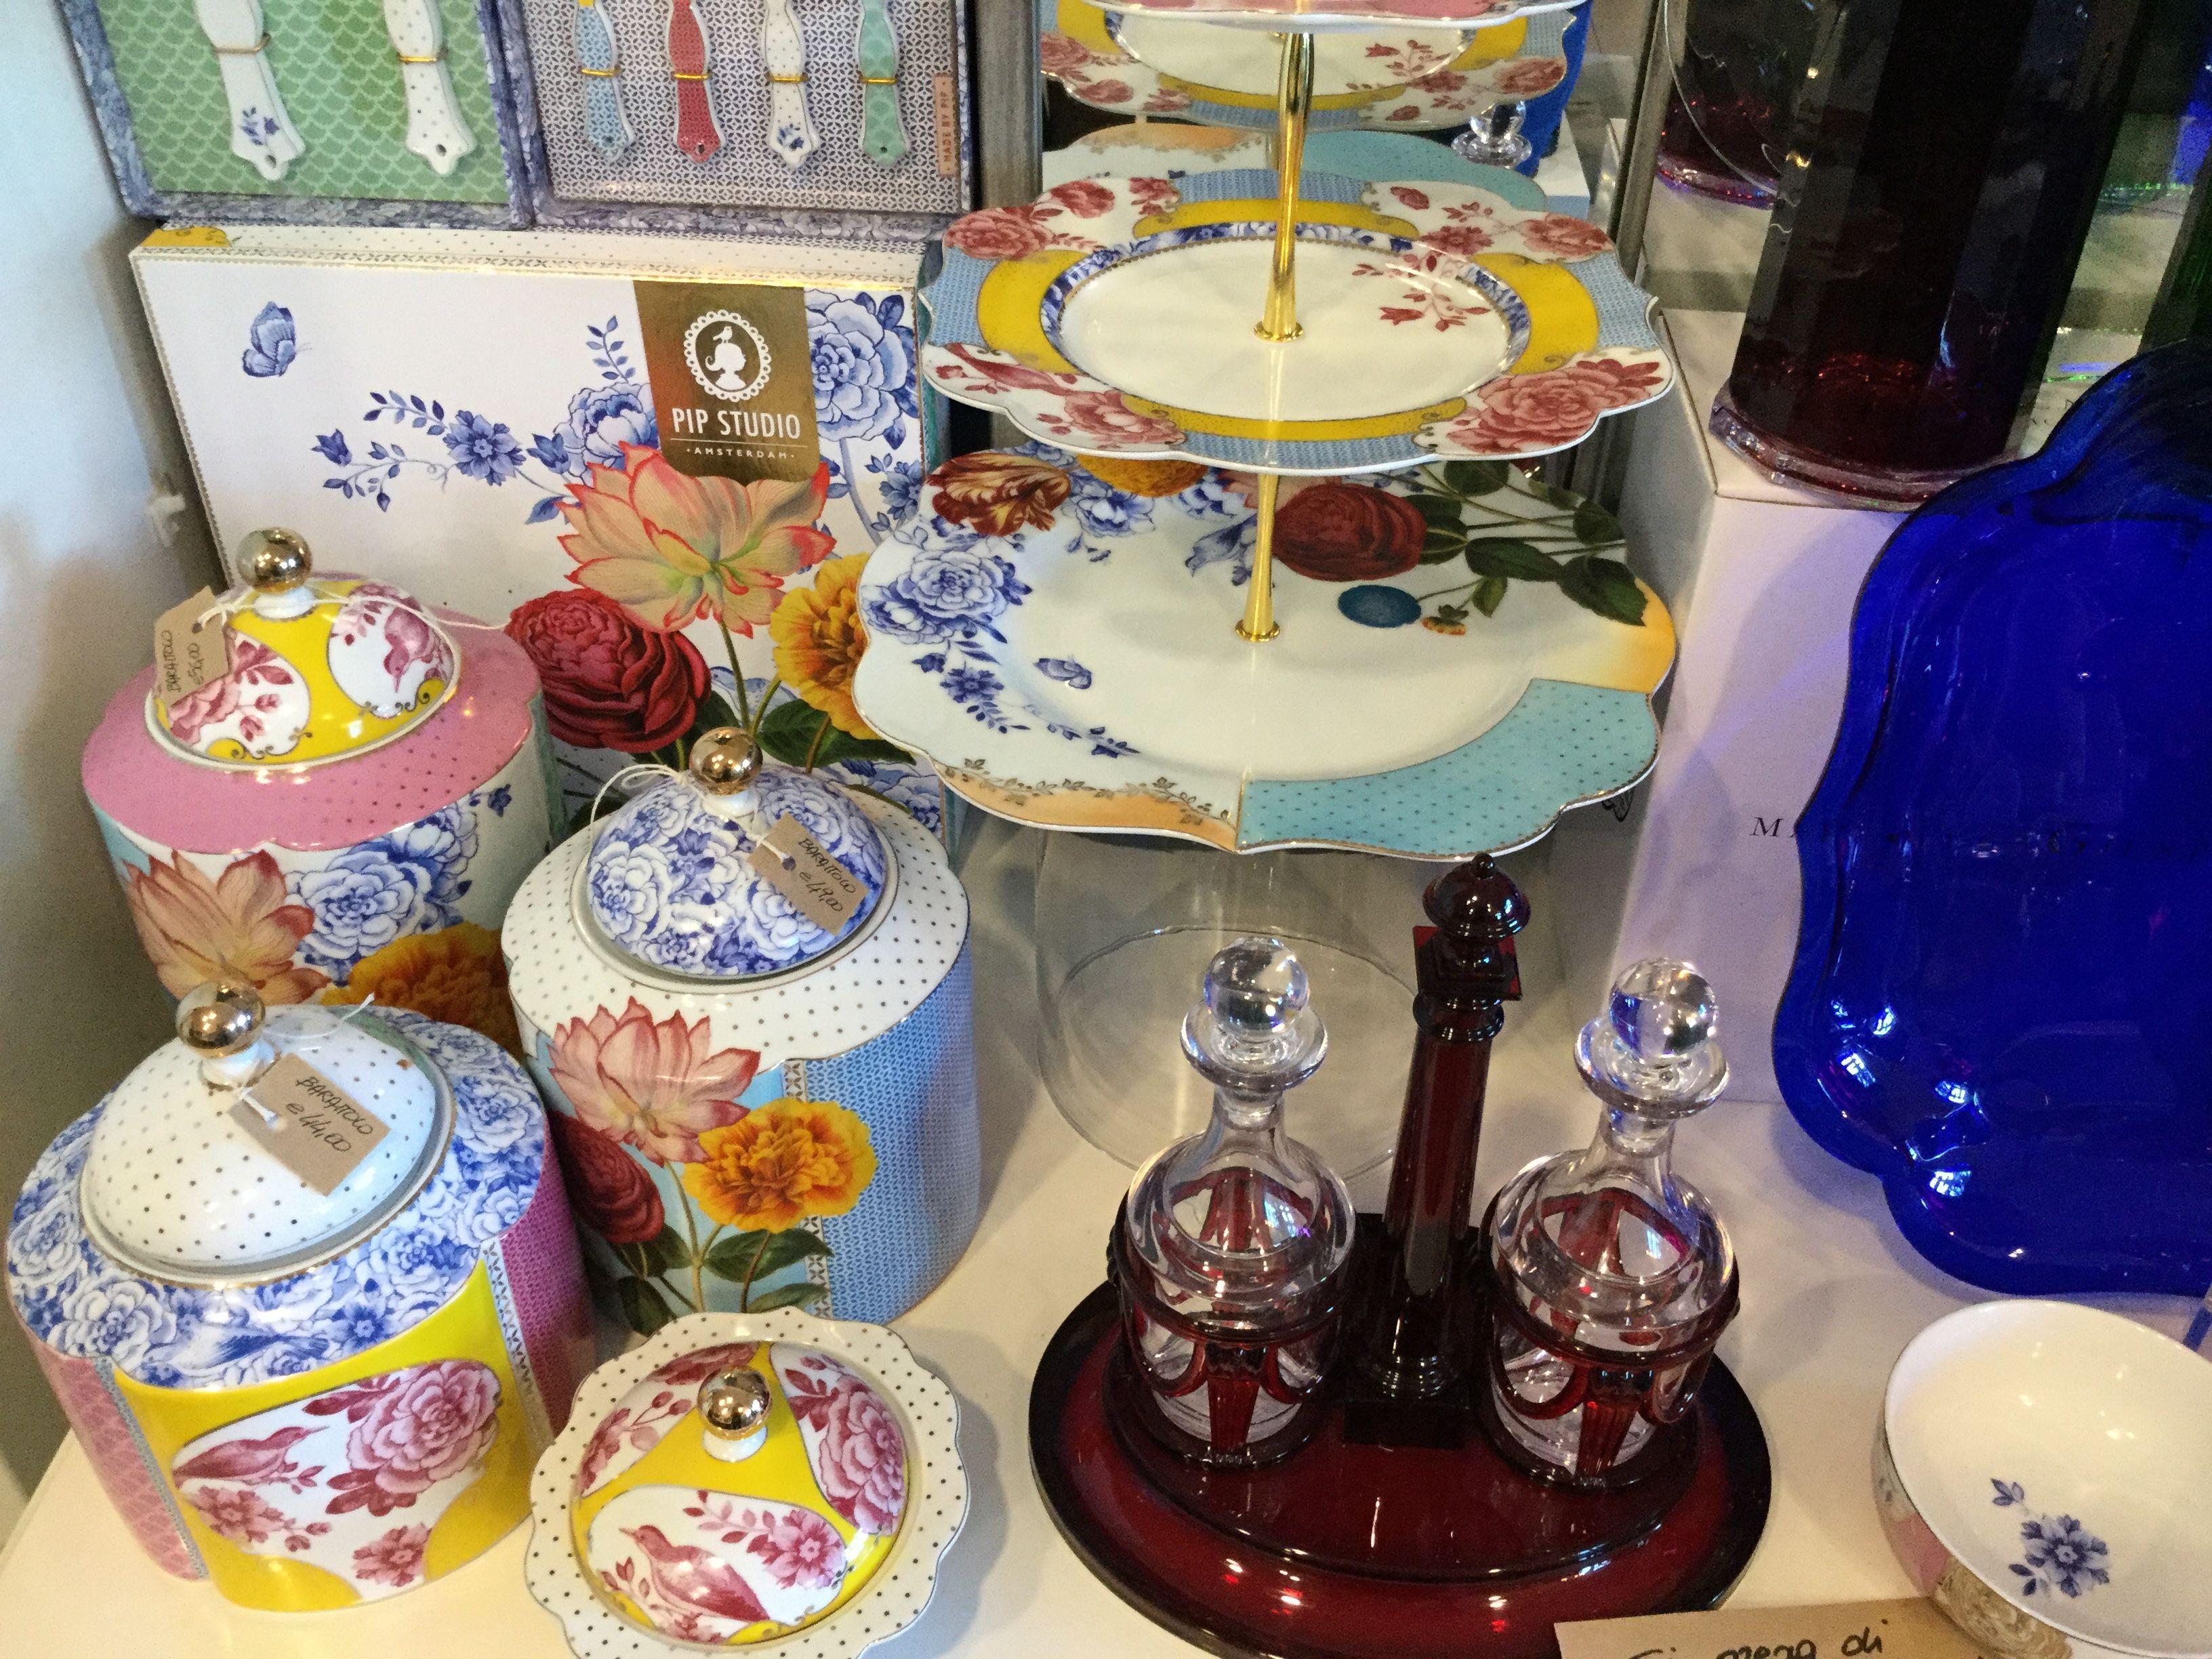 Pip Studio Royal Collection